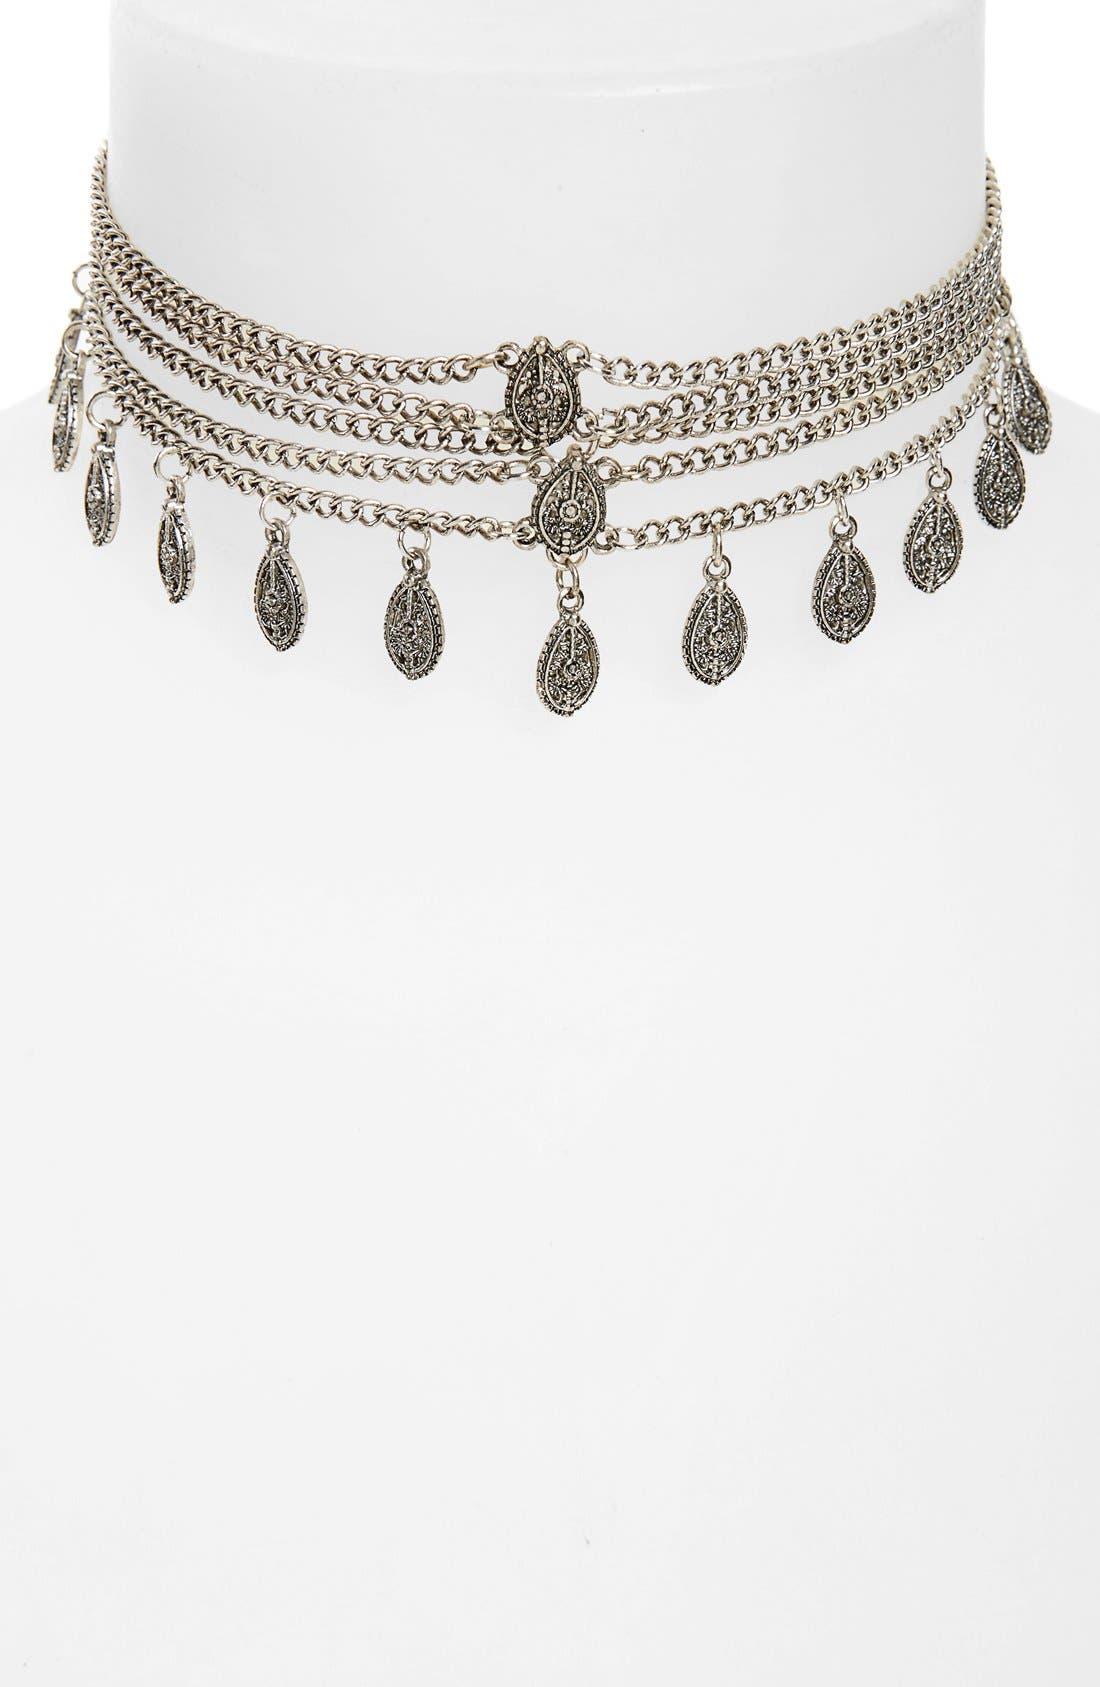 Main Image - Loren Olivia Multistrand Choker Necklace